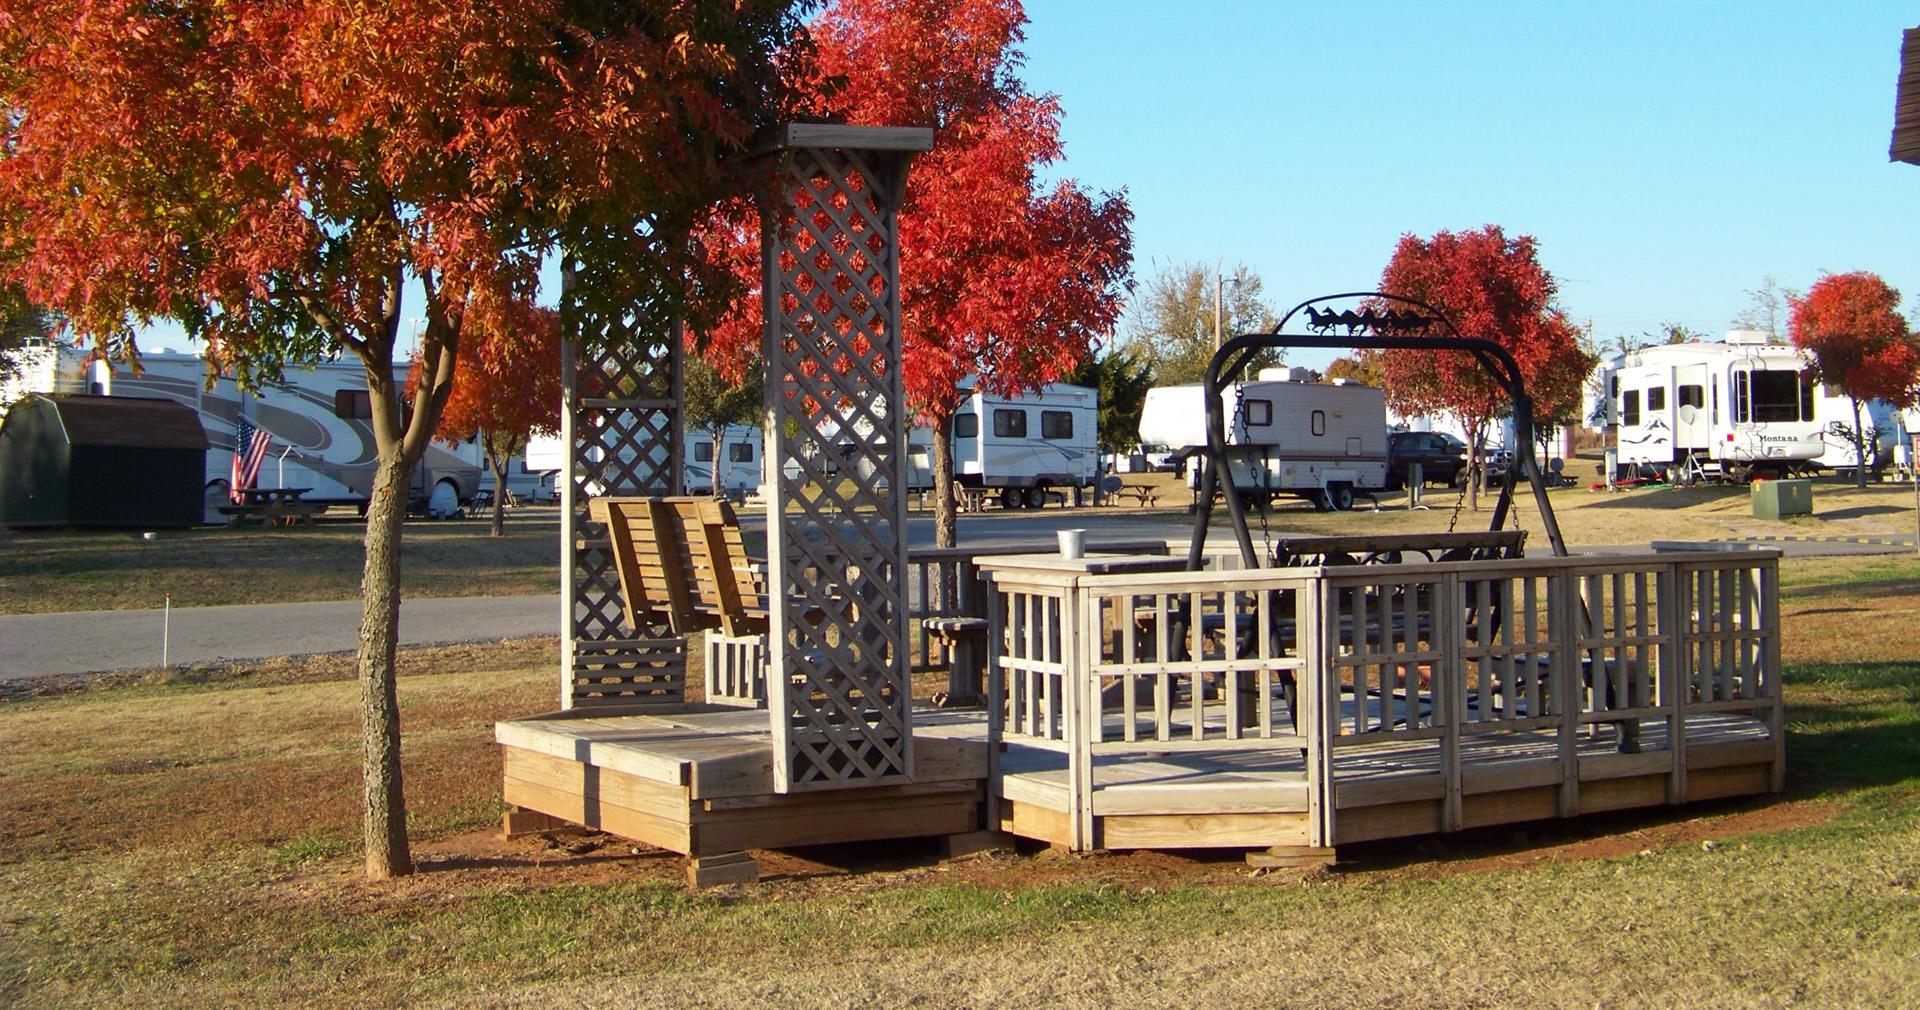 A-AAA RV Park: Adult RV Park in Oklahoma